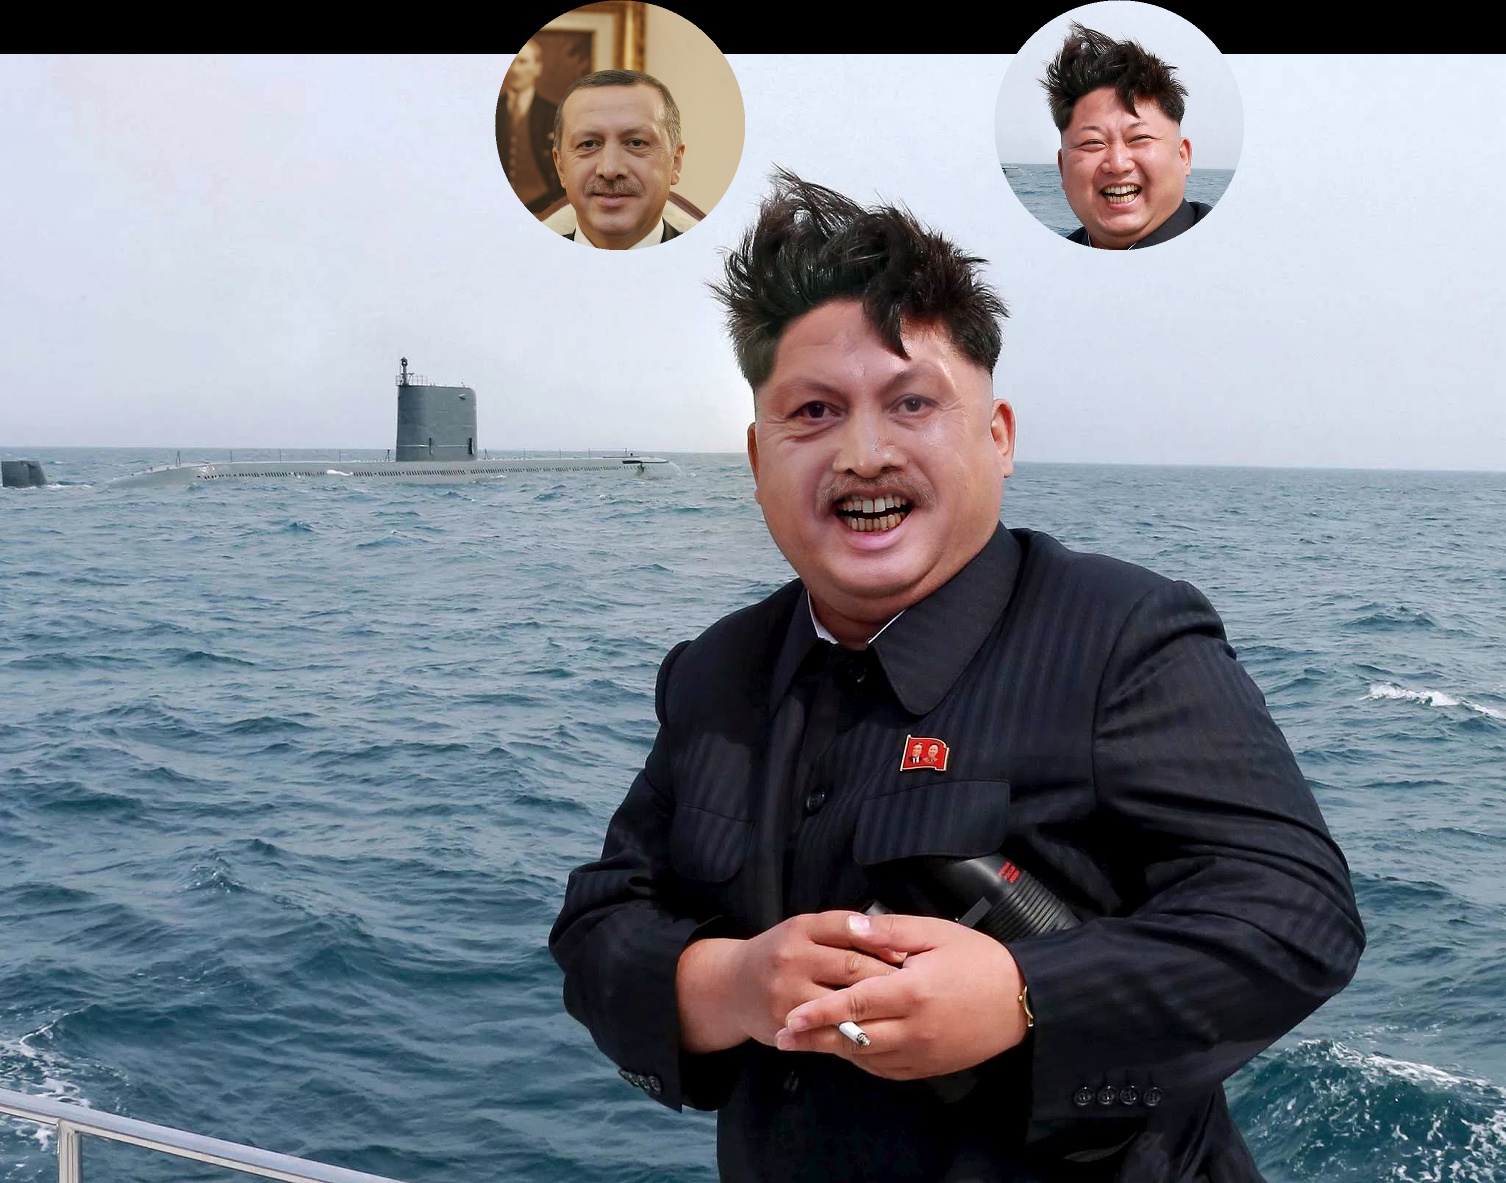 recep_tayyip_erdogan_03_kim_jong_un_04_overlay.jpg